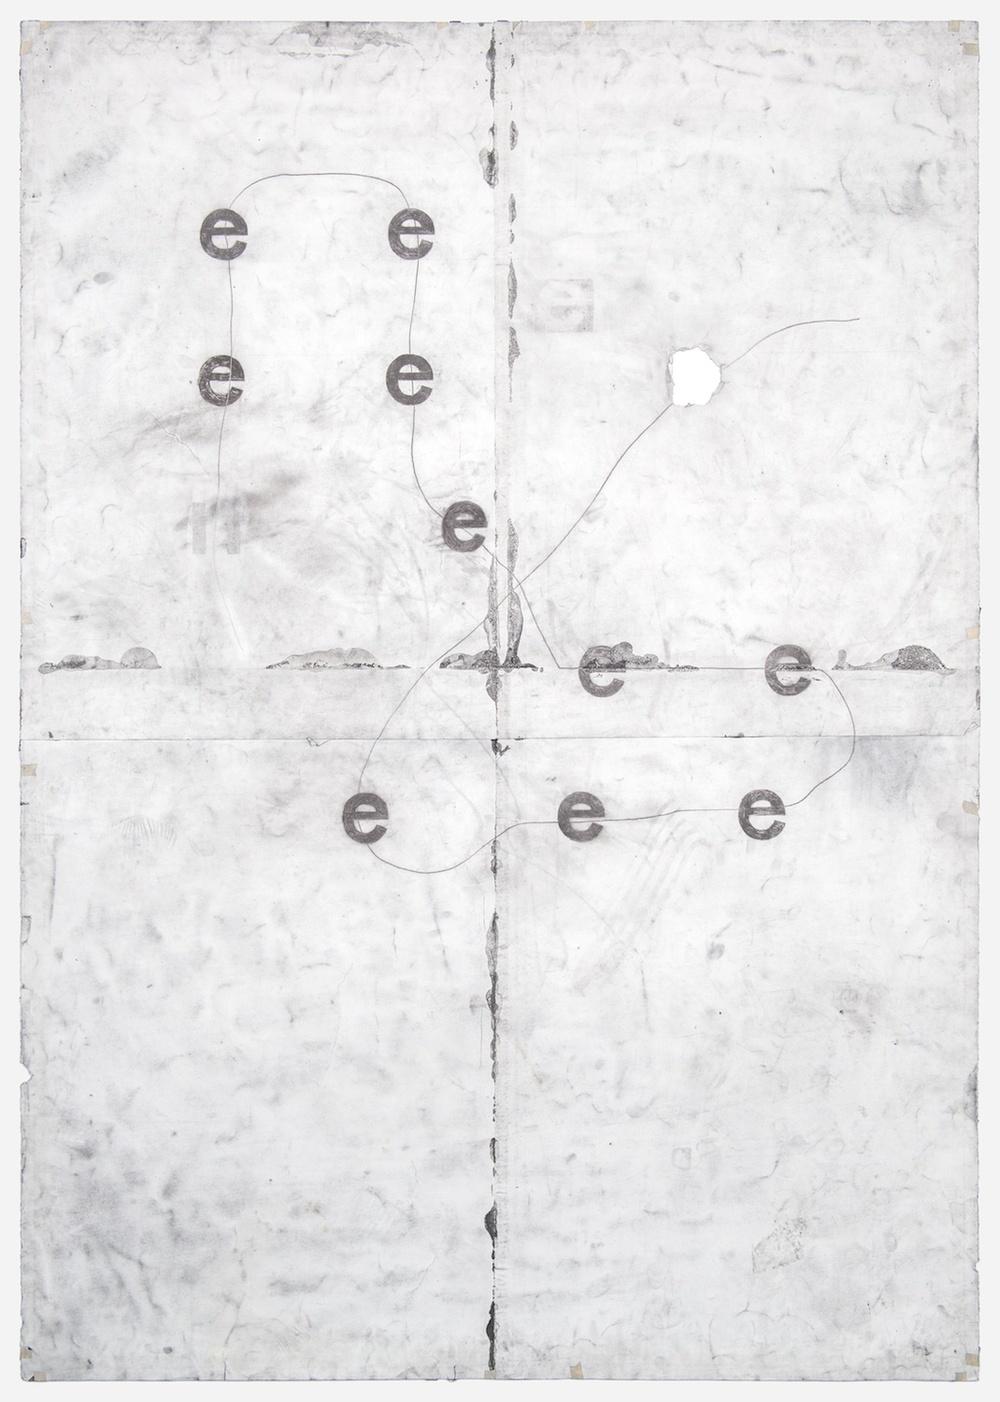 Tony Lewis  e e e e e e e e e e  2011 Pencil and powdered graphite on paper 84h x 60w in TL030